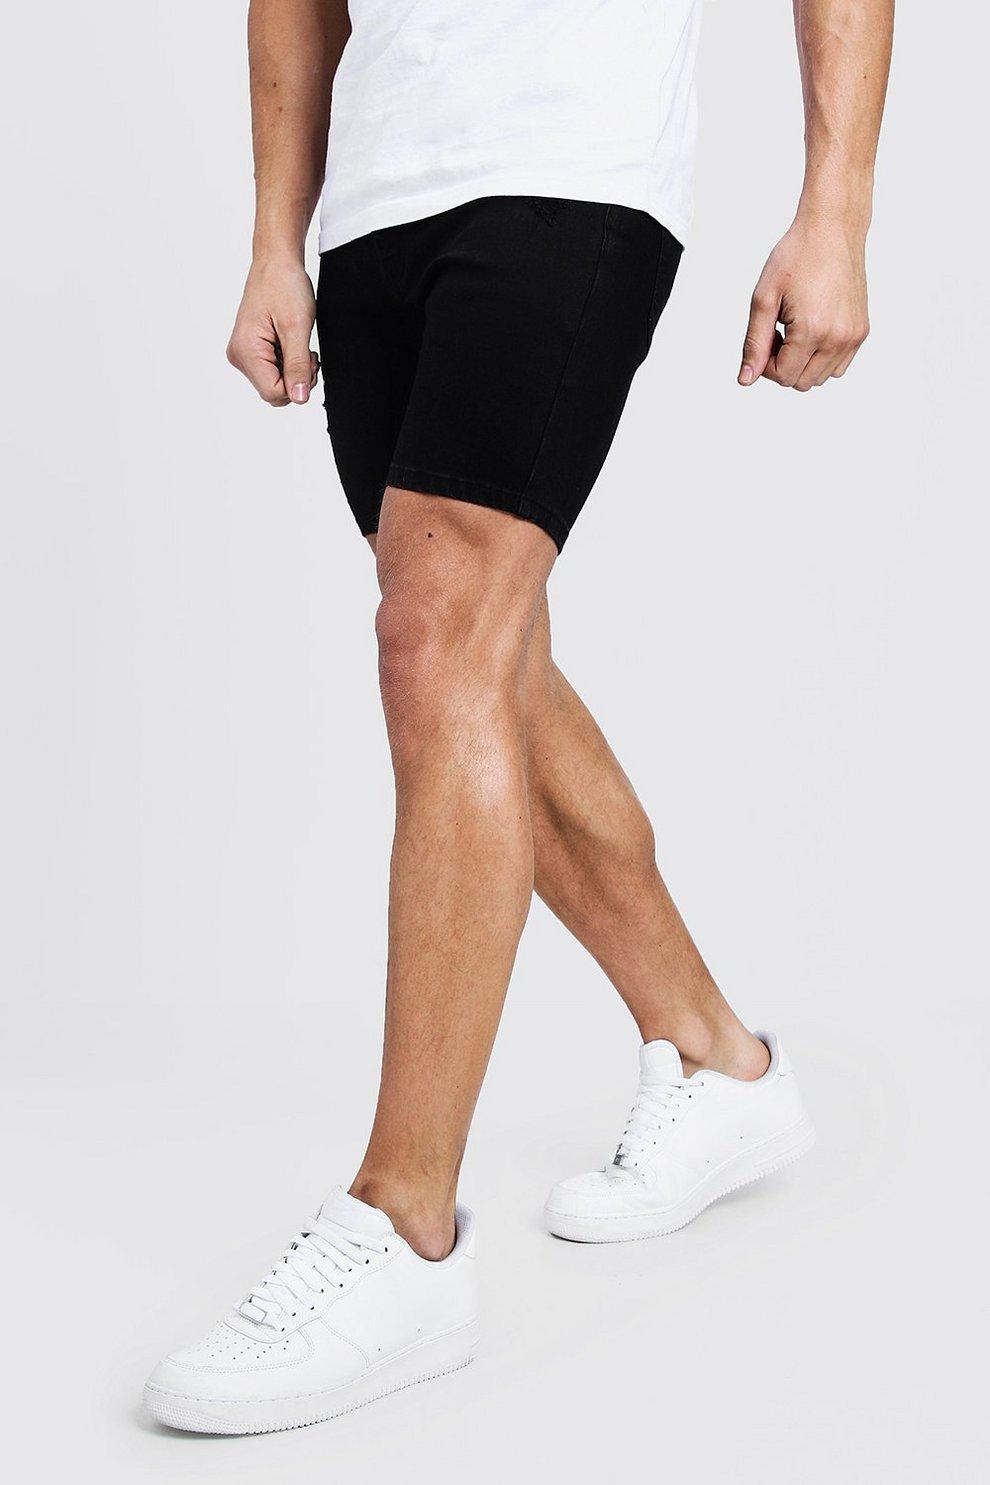 Camuflaje Trasera Parte Con Cortos La Denim En De Pantalones Skinny LpVGjSzqUM